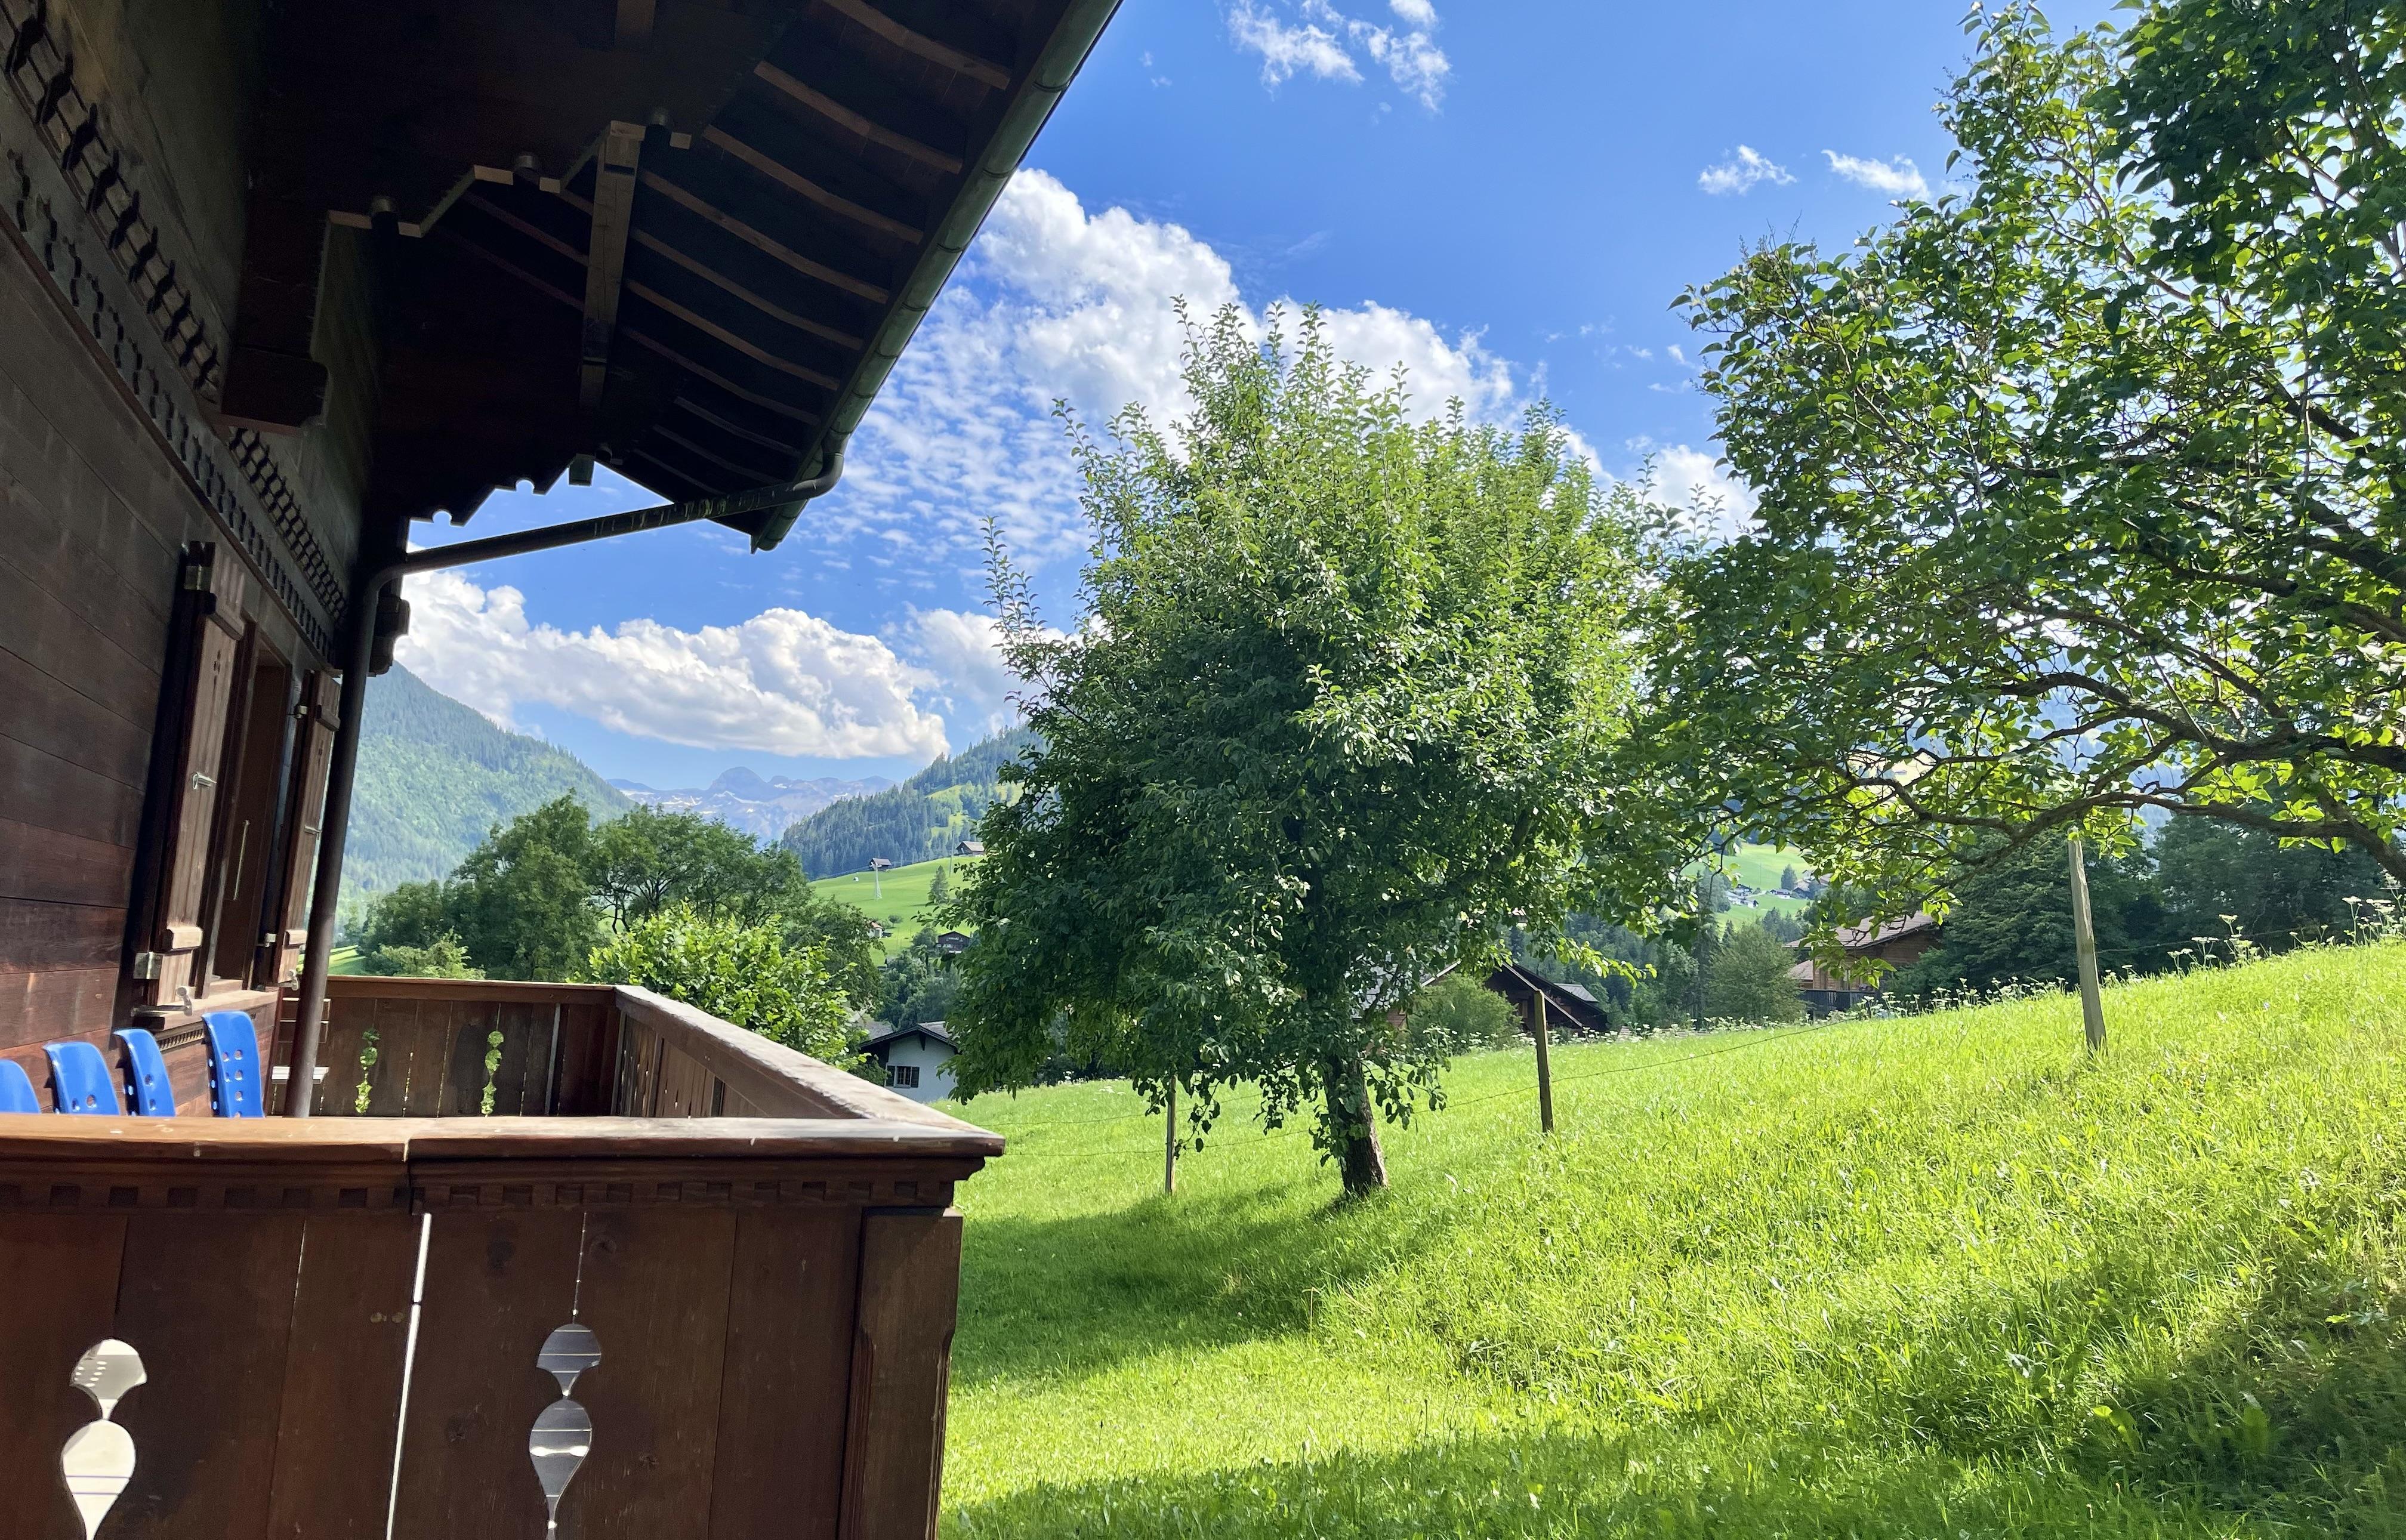 Ferienwohnung Akelei (gross) 7-Bettwohnung (592359), Zweisimmen, Simmental, Berner Oberland, Schweiz, Bild 6